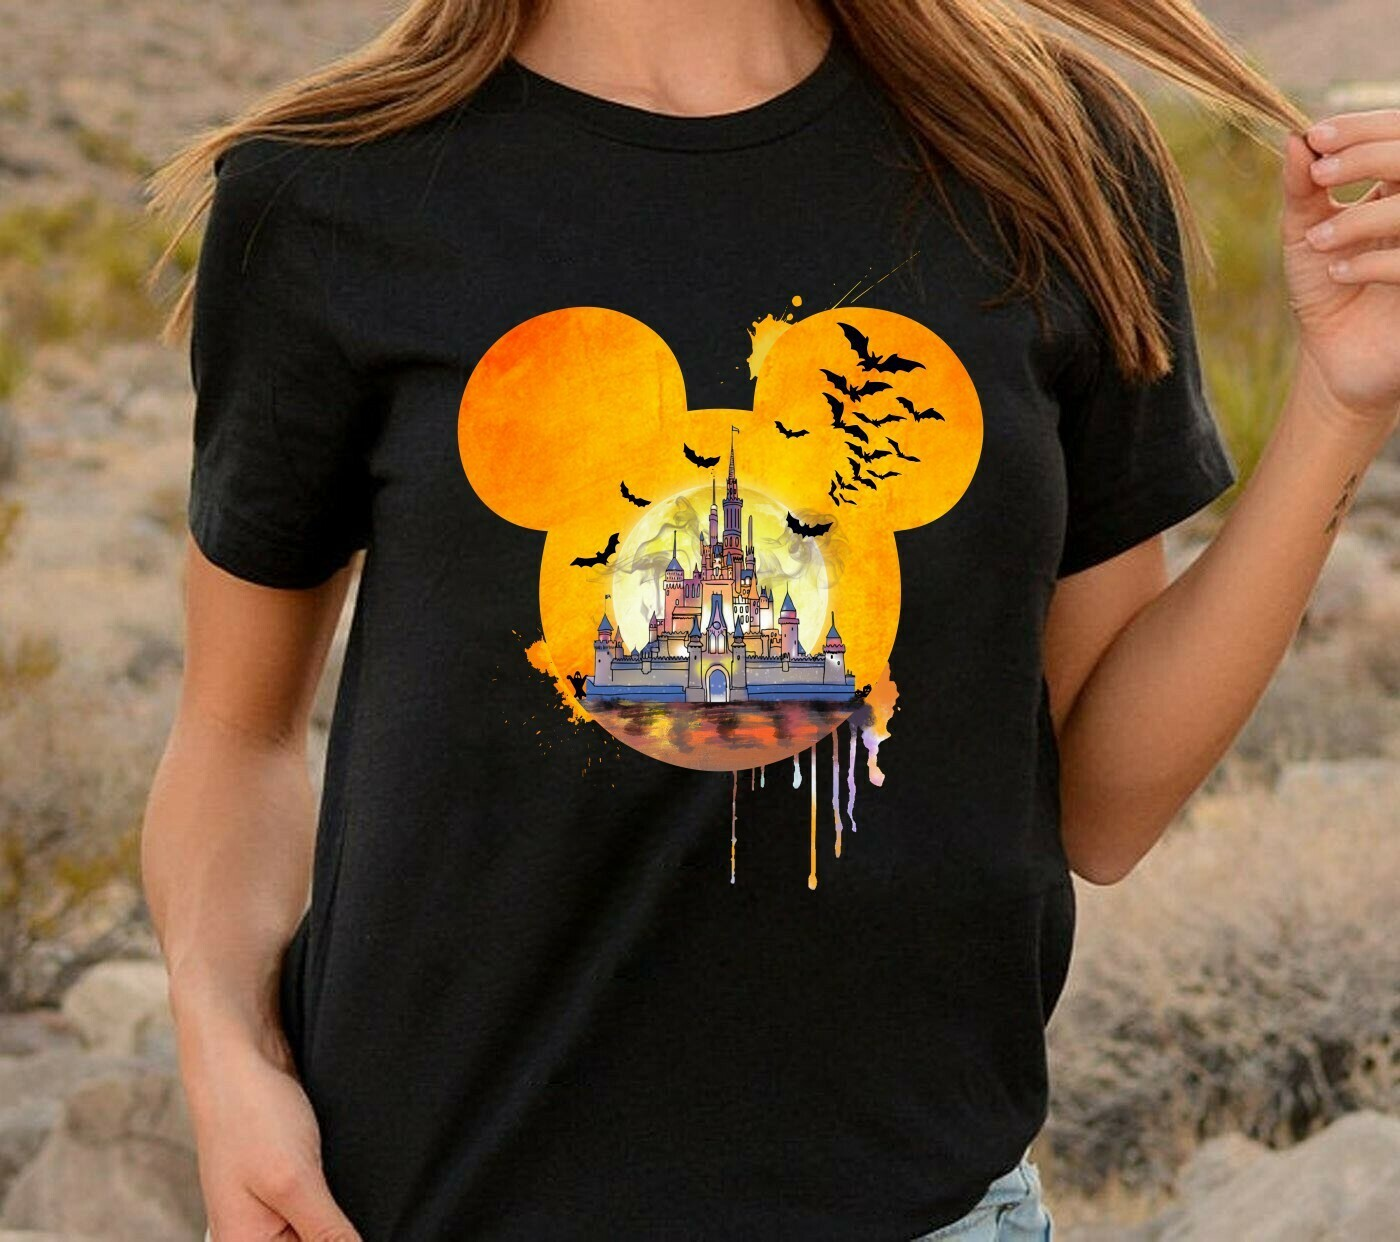 Disney Halloween Castle I'm going to Walt Disney Vacation Family Let's Go to Disney World Disneyland Tee Park T Shirt Long Sleeve Sweatshirt Hoodie Jolly Family Gifts